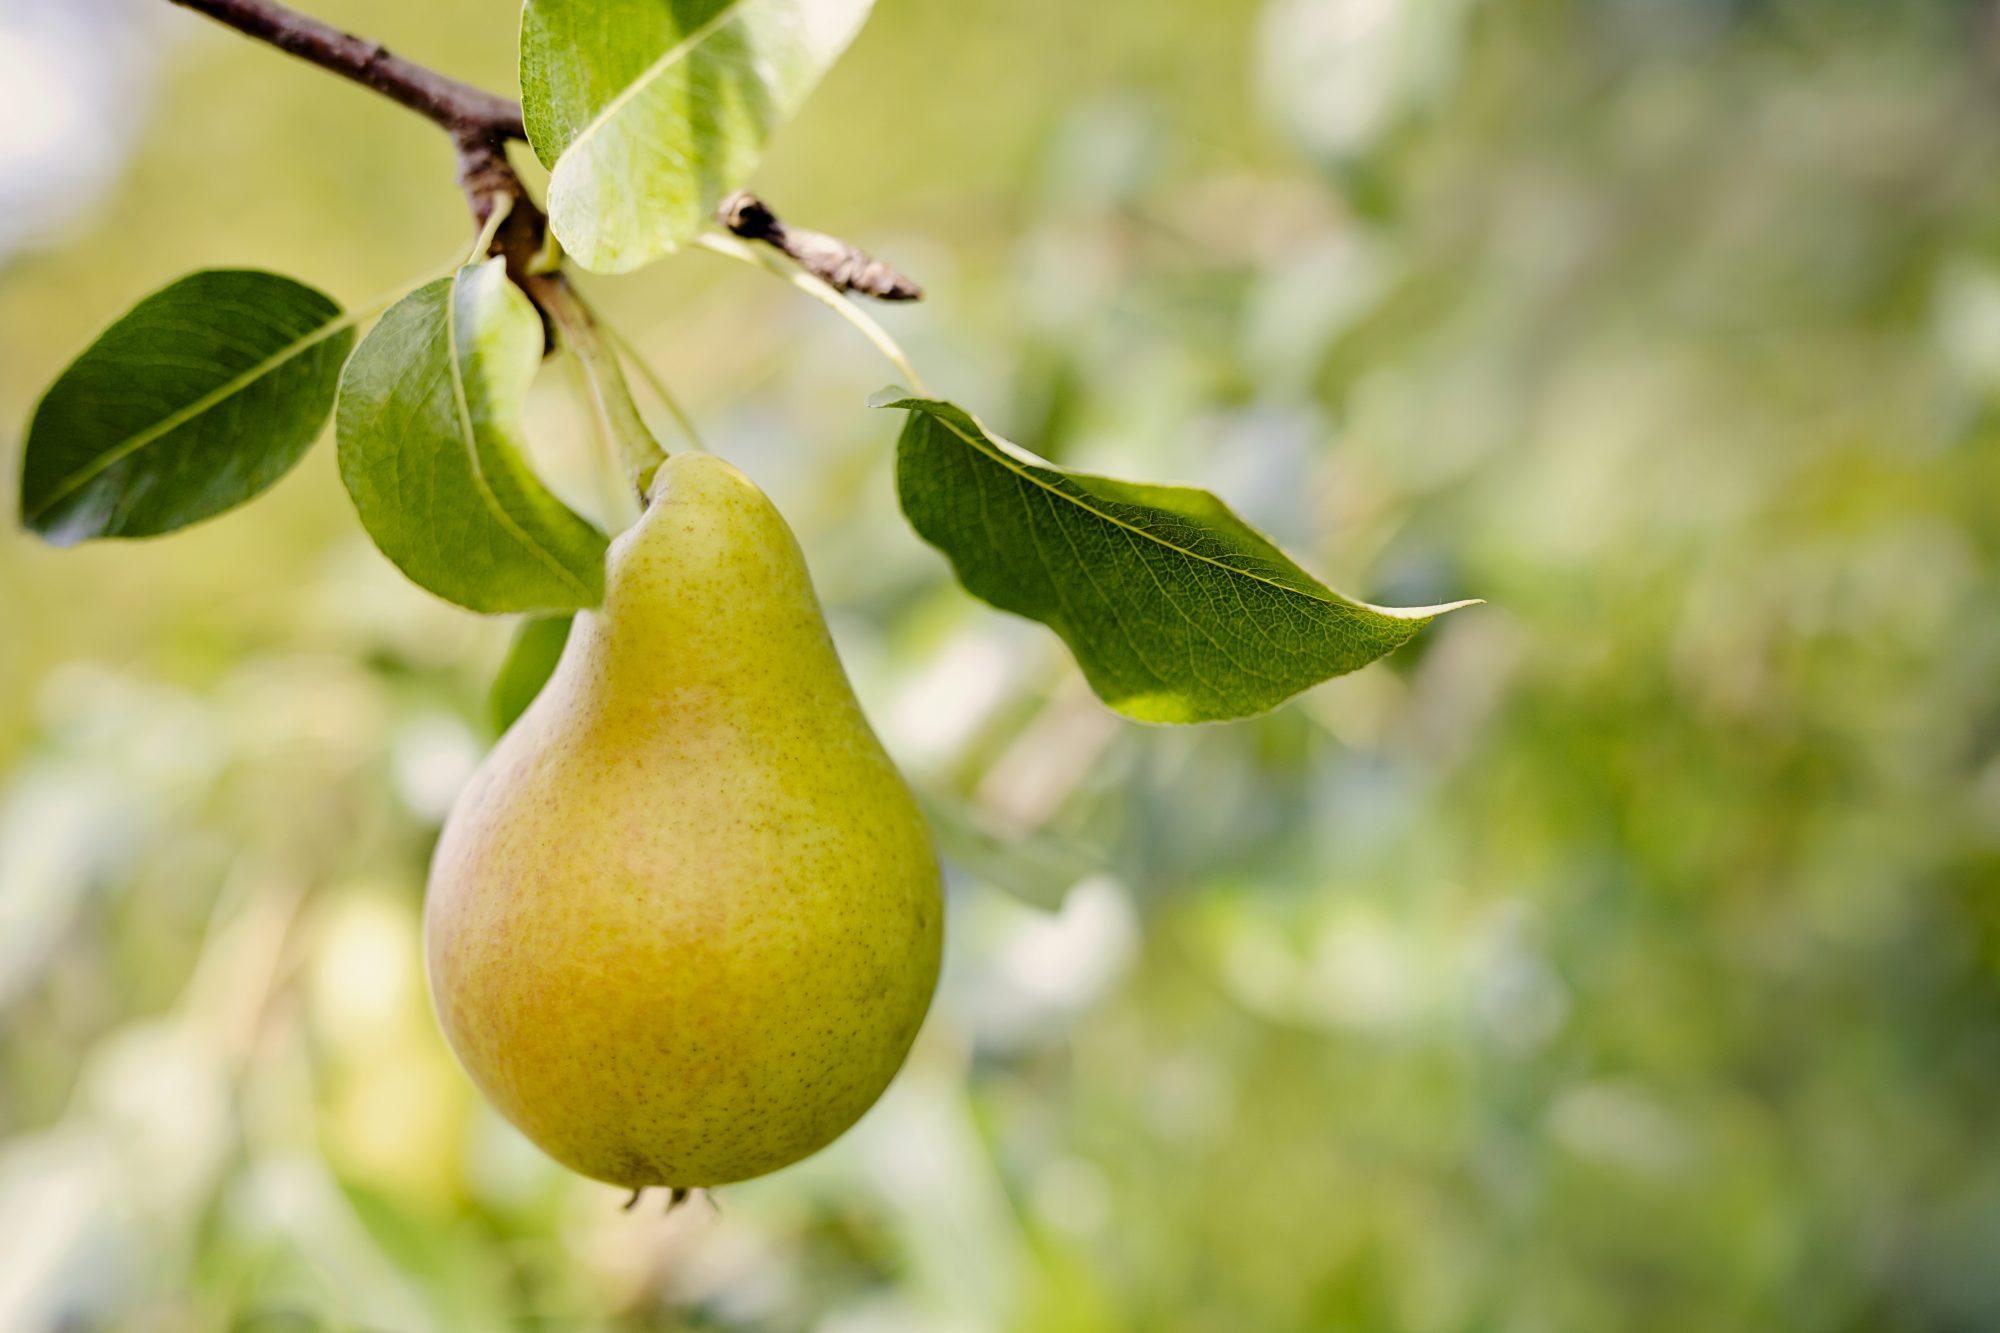 Pear on tree Getty 9/3/20